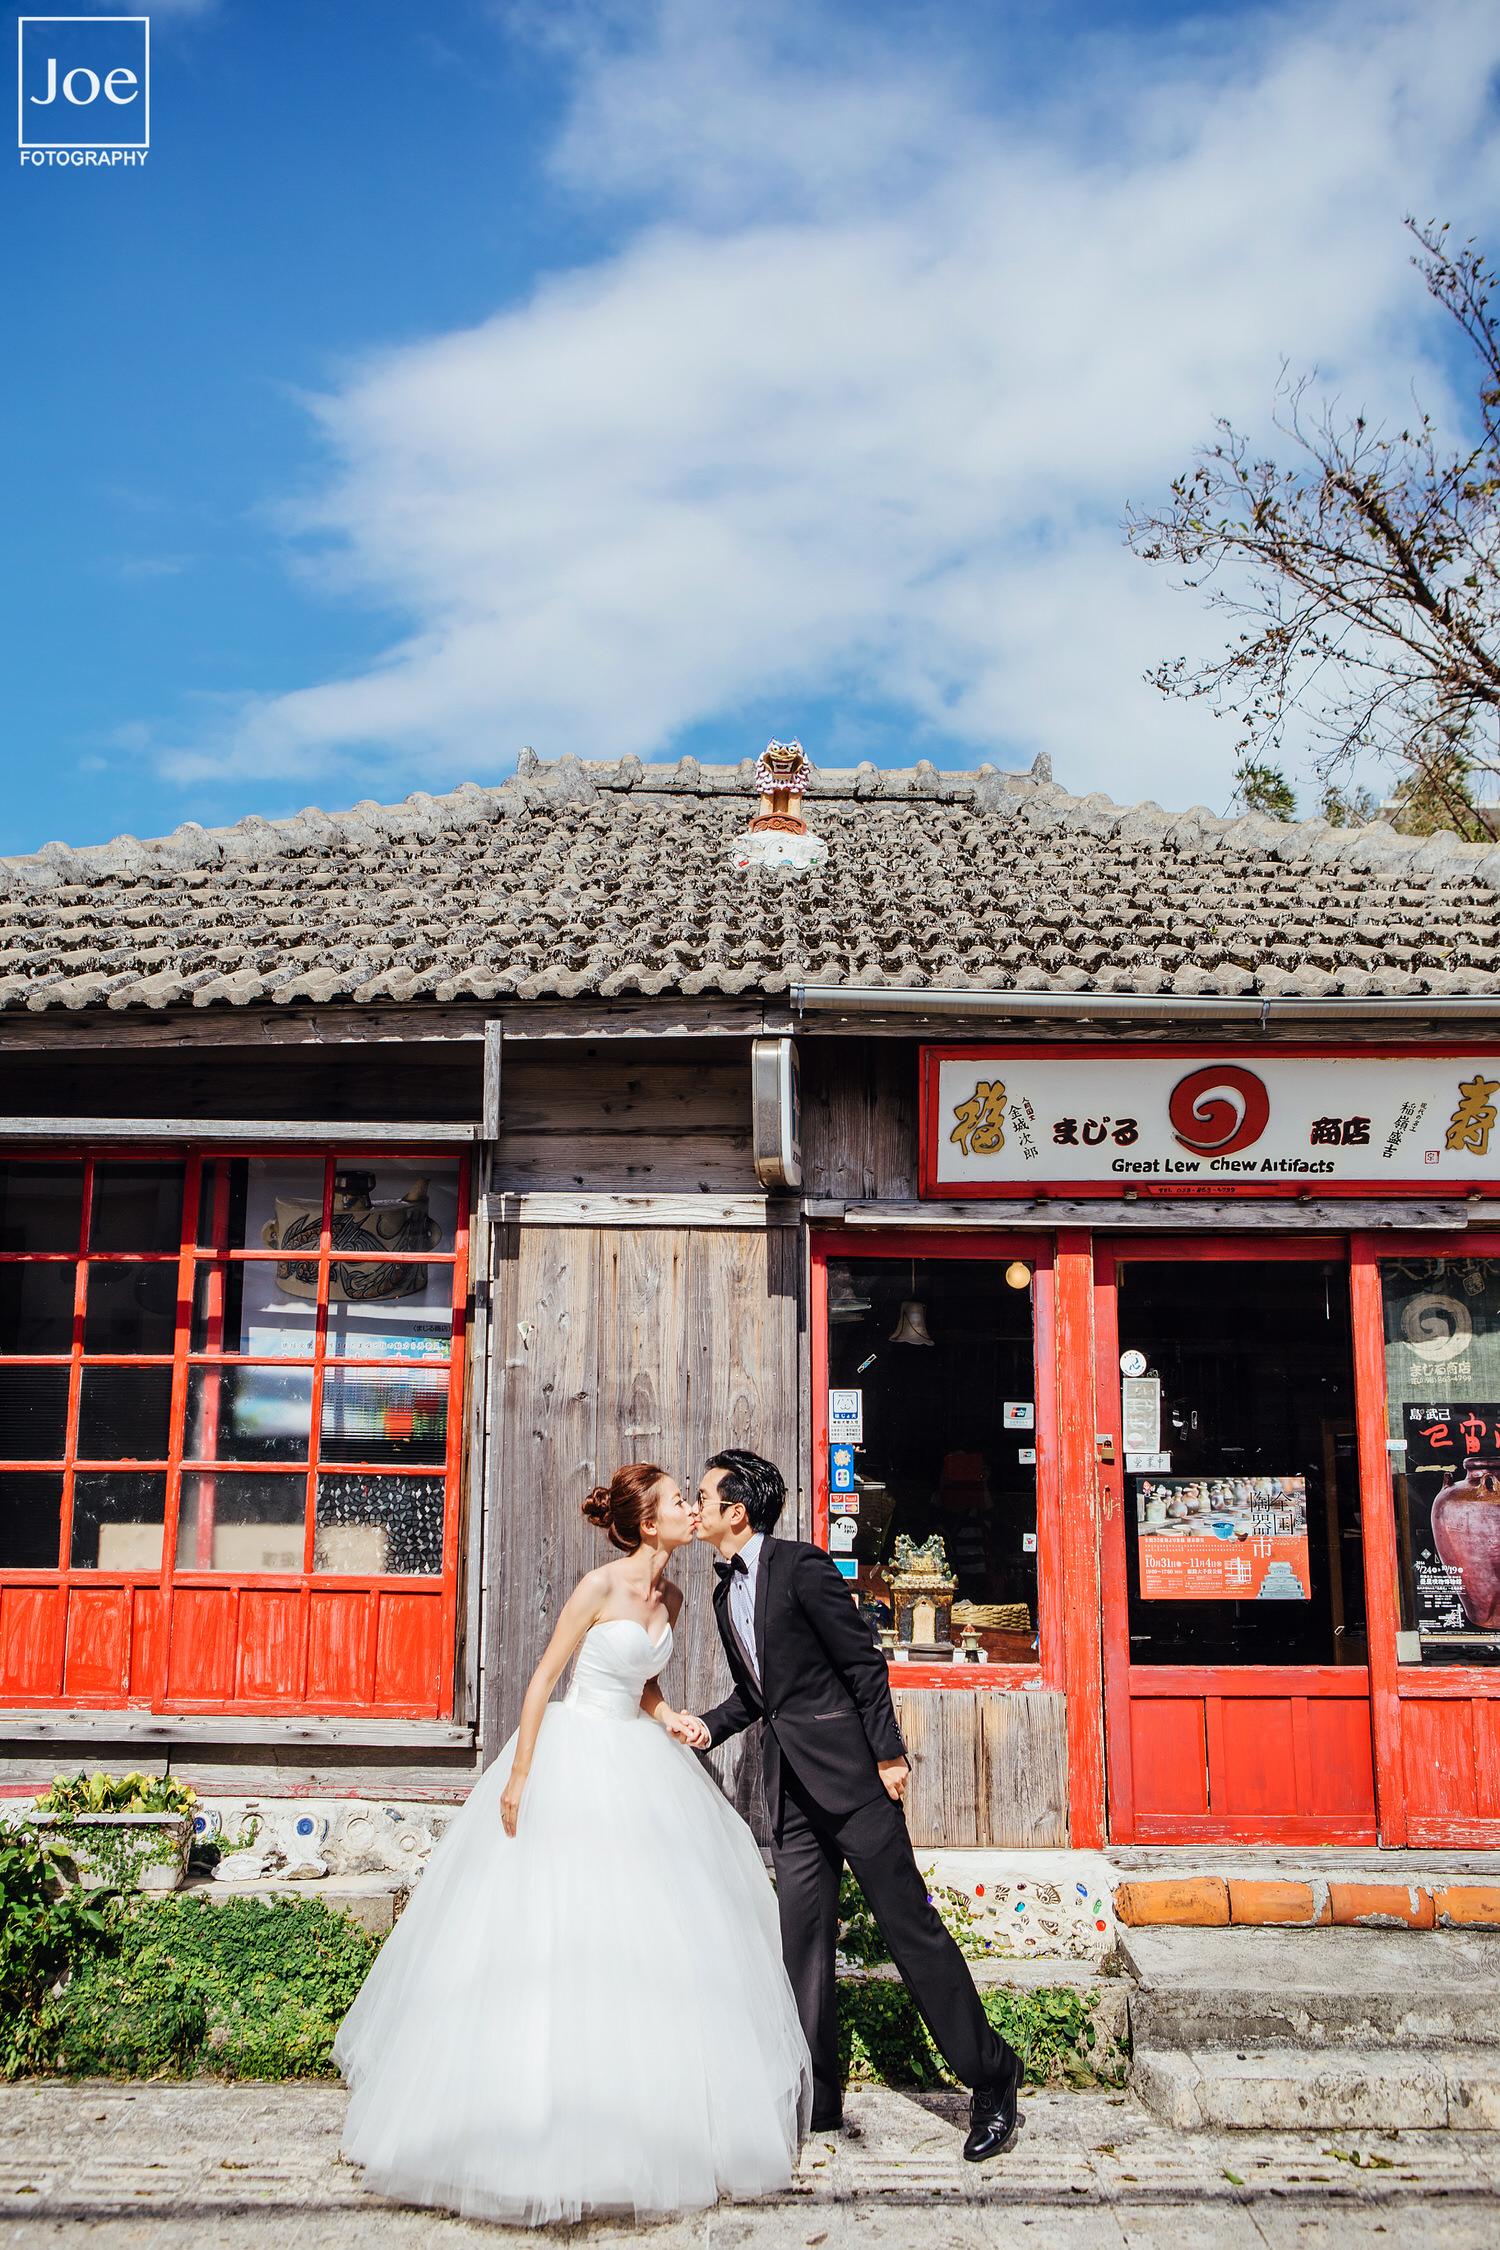 17-okinawa-yacchi-moon-pre-wedding-melody-amigo-joe-fotography.jpg